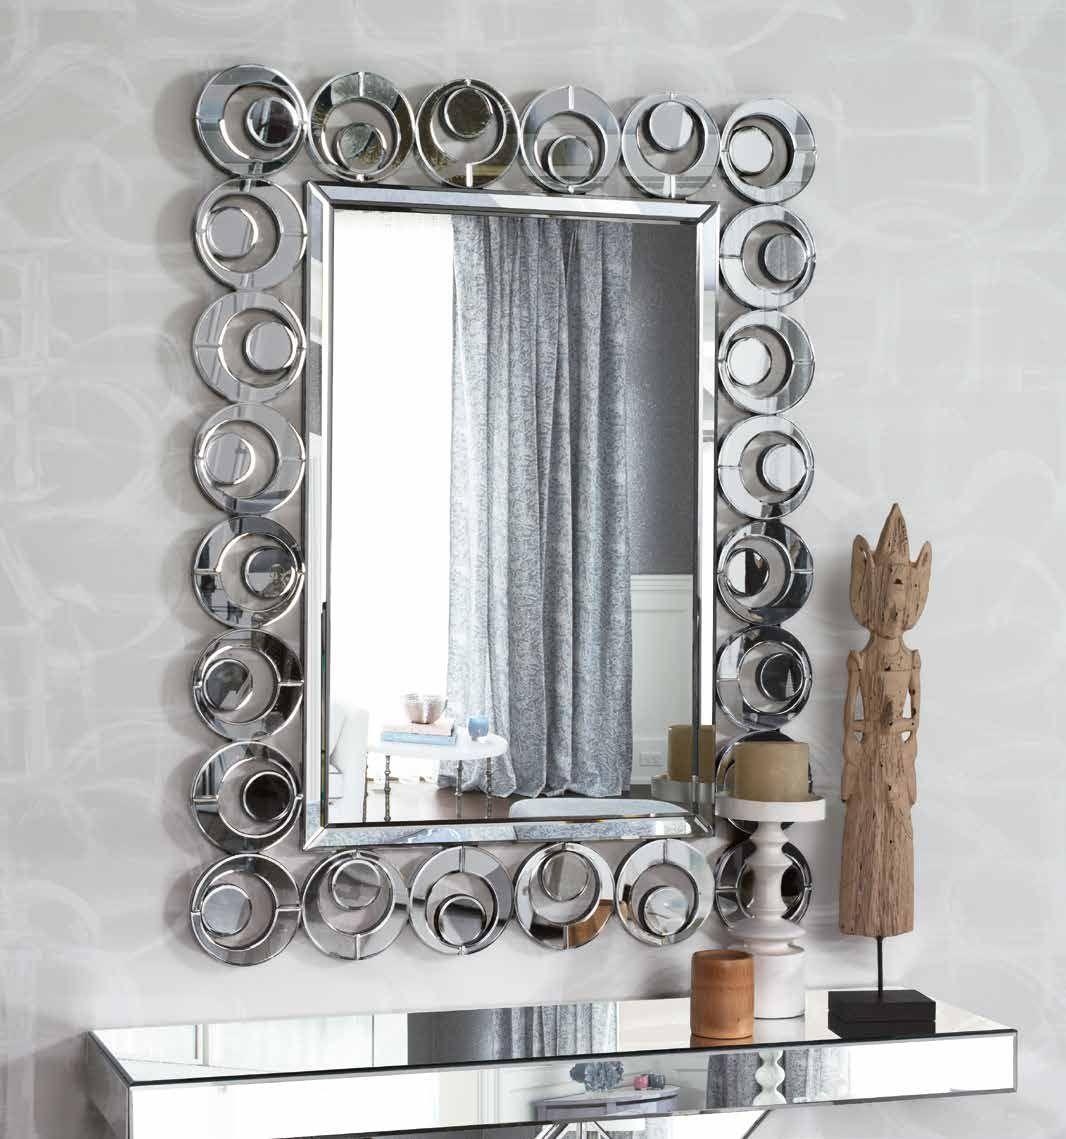 DIS-ARTE Circulos Tangentes 8230 | Espejos de Diseño | Pinterest | Walls